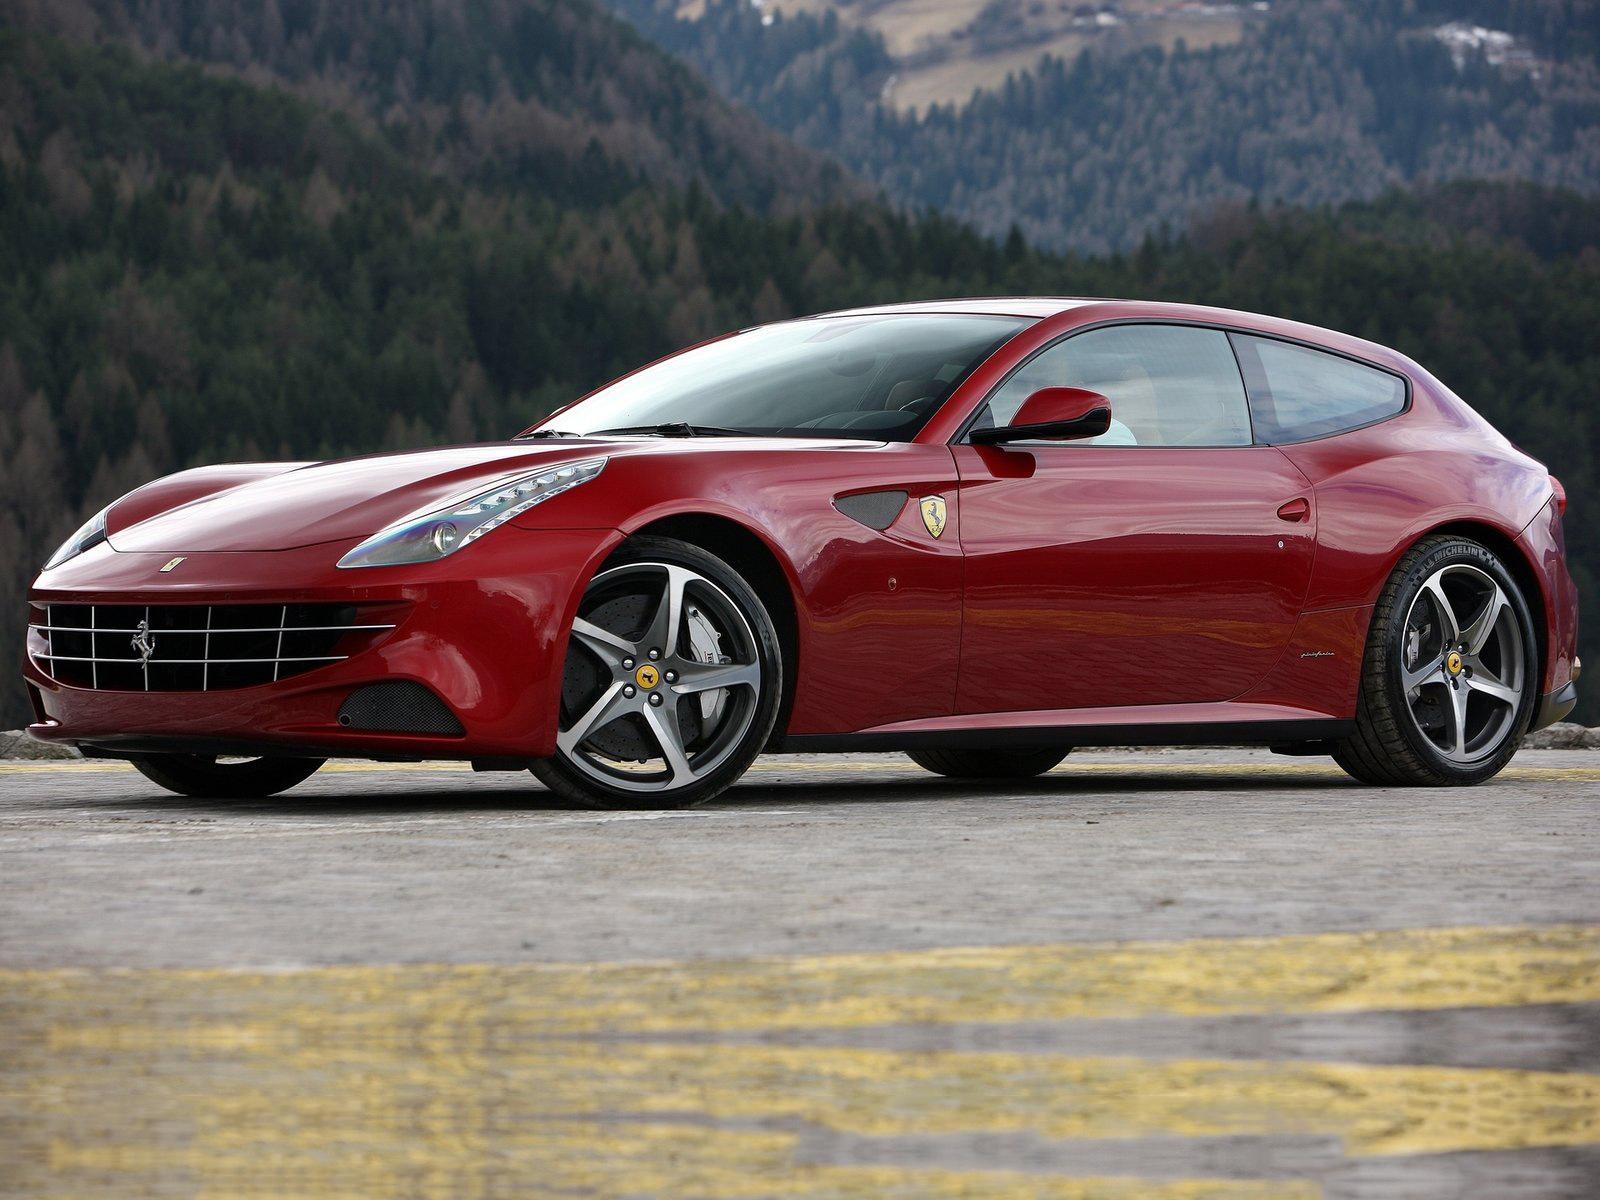 Ferrari FF exterior